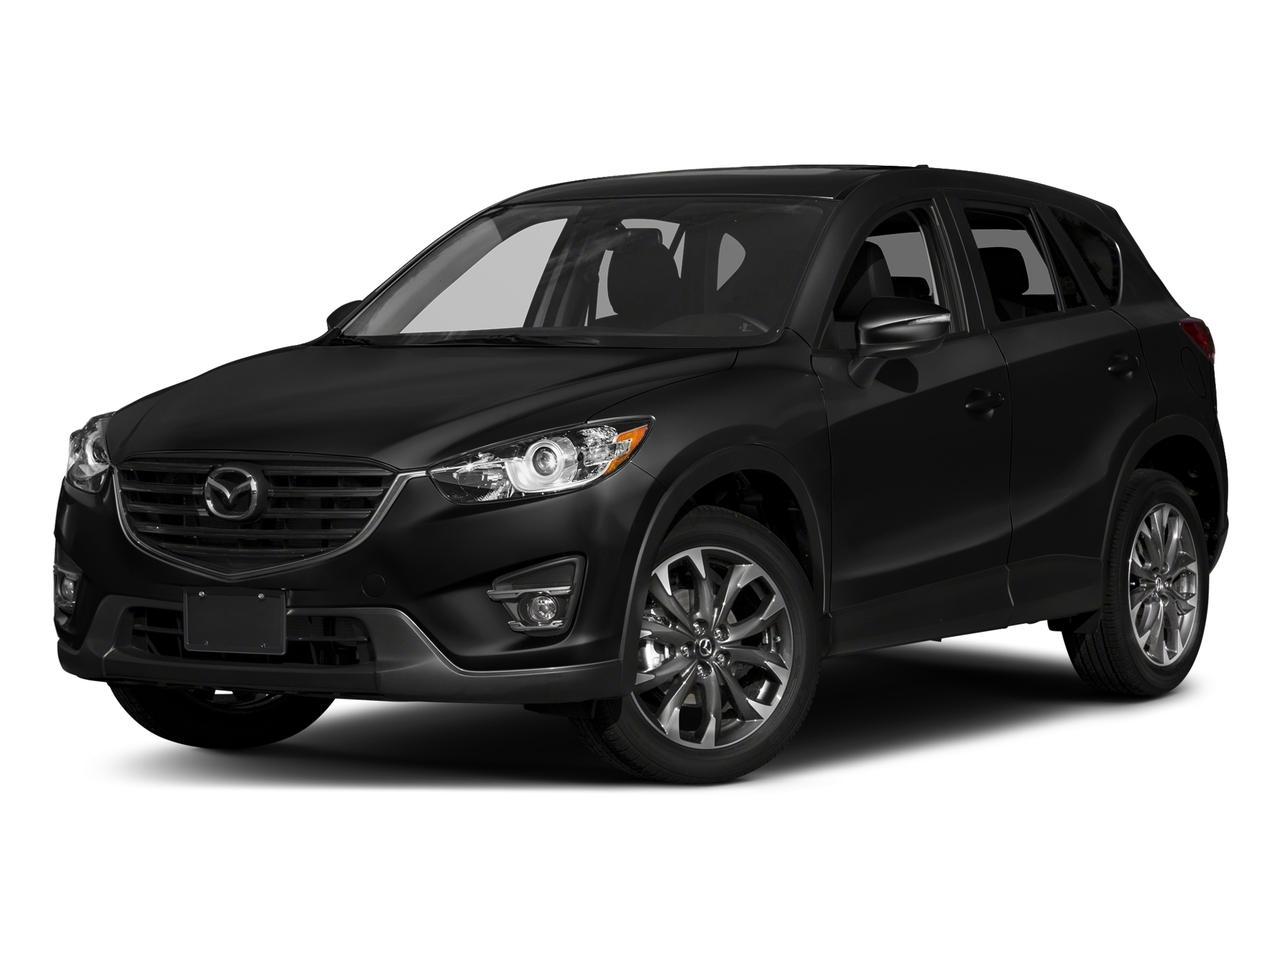 2016 Mazda CX-5 Vehicle Photo in Houston, TX 77054